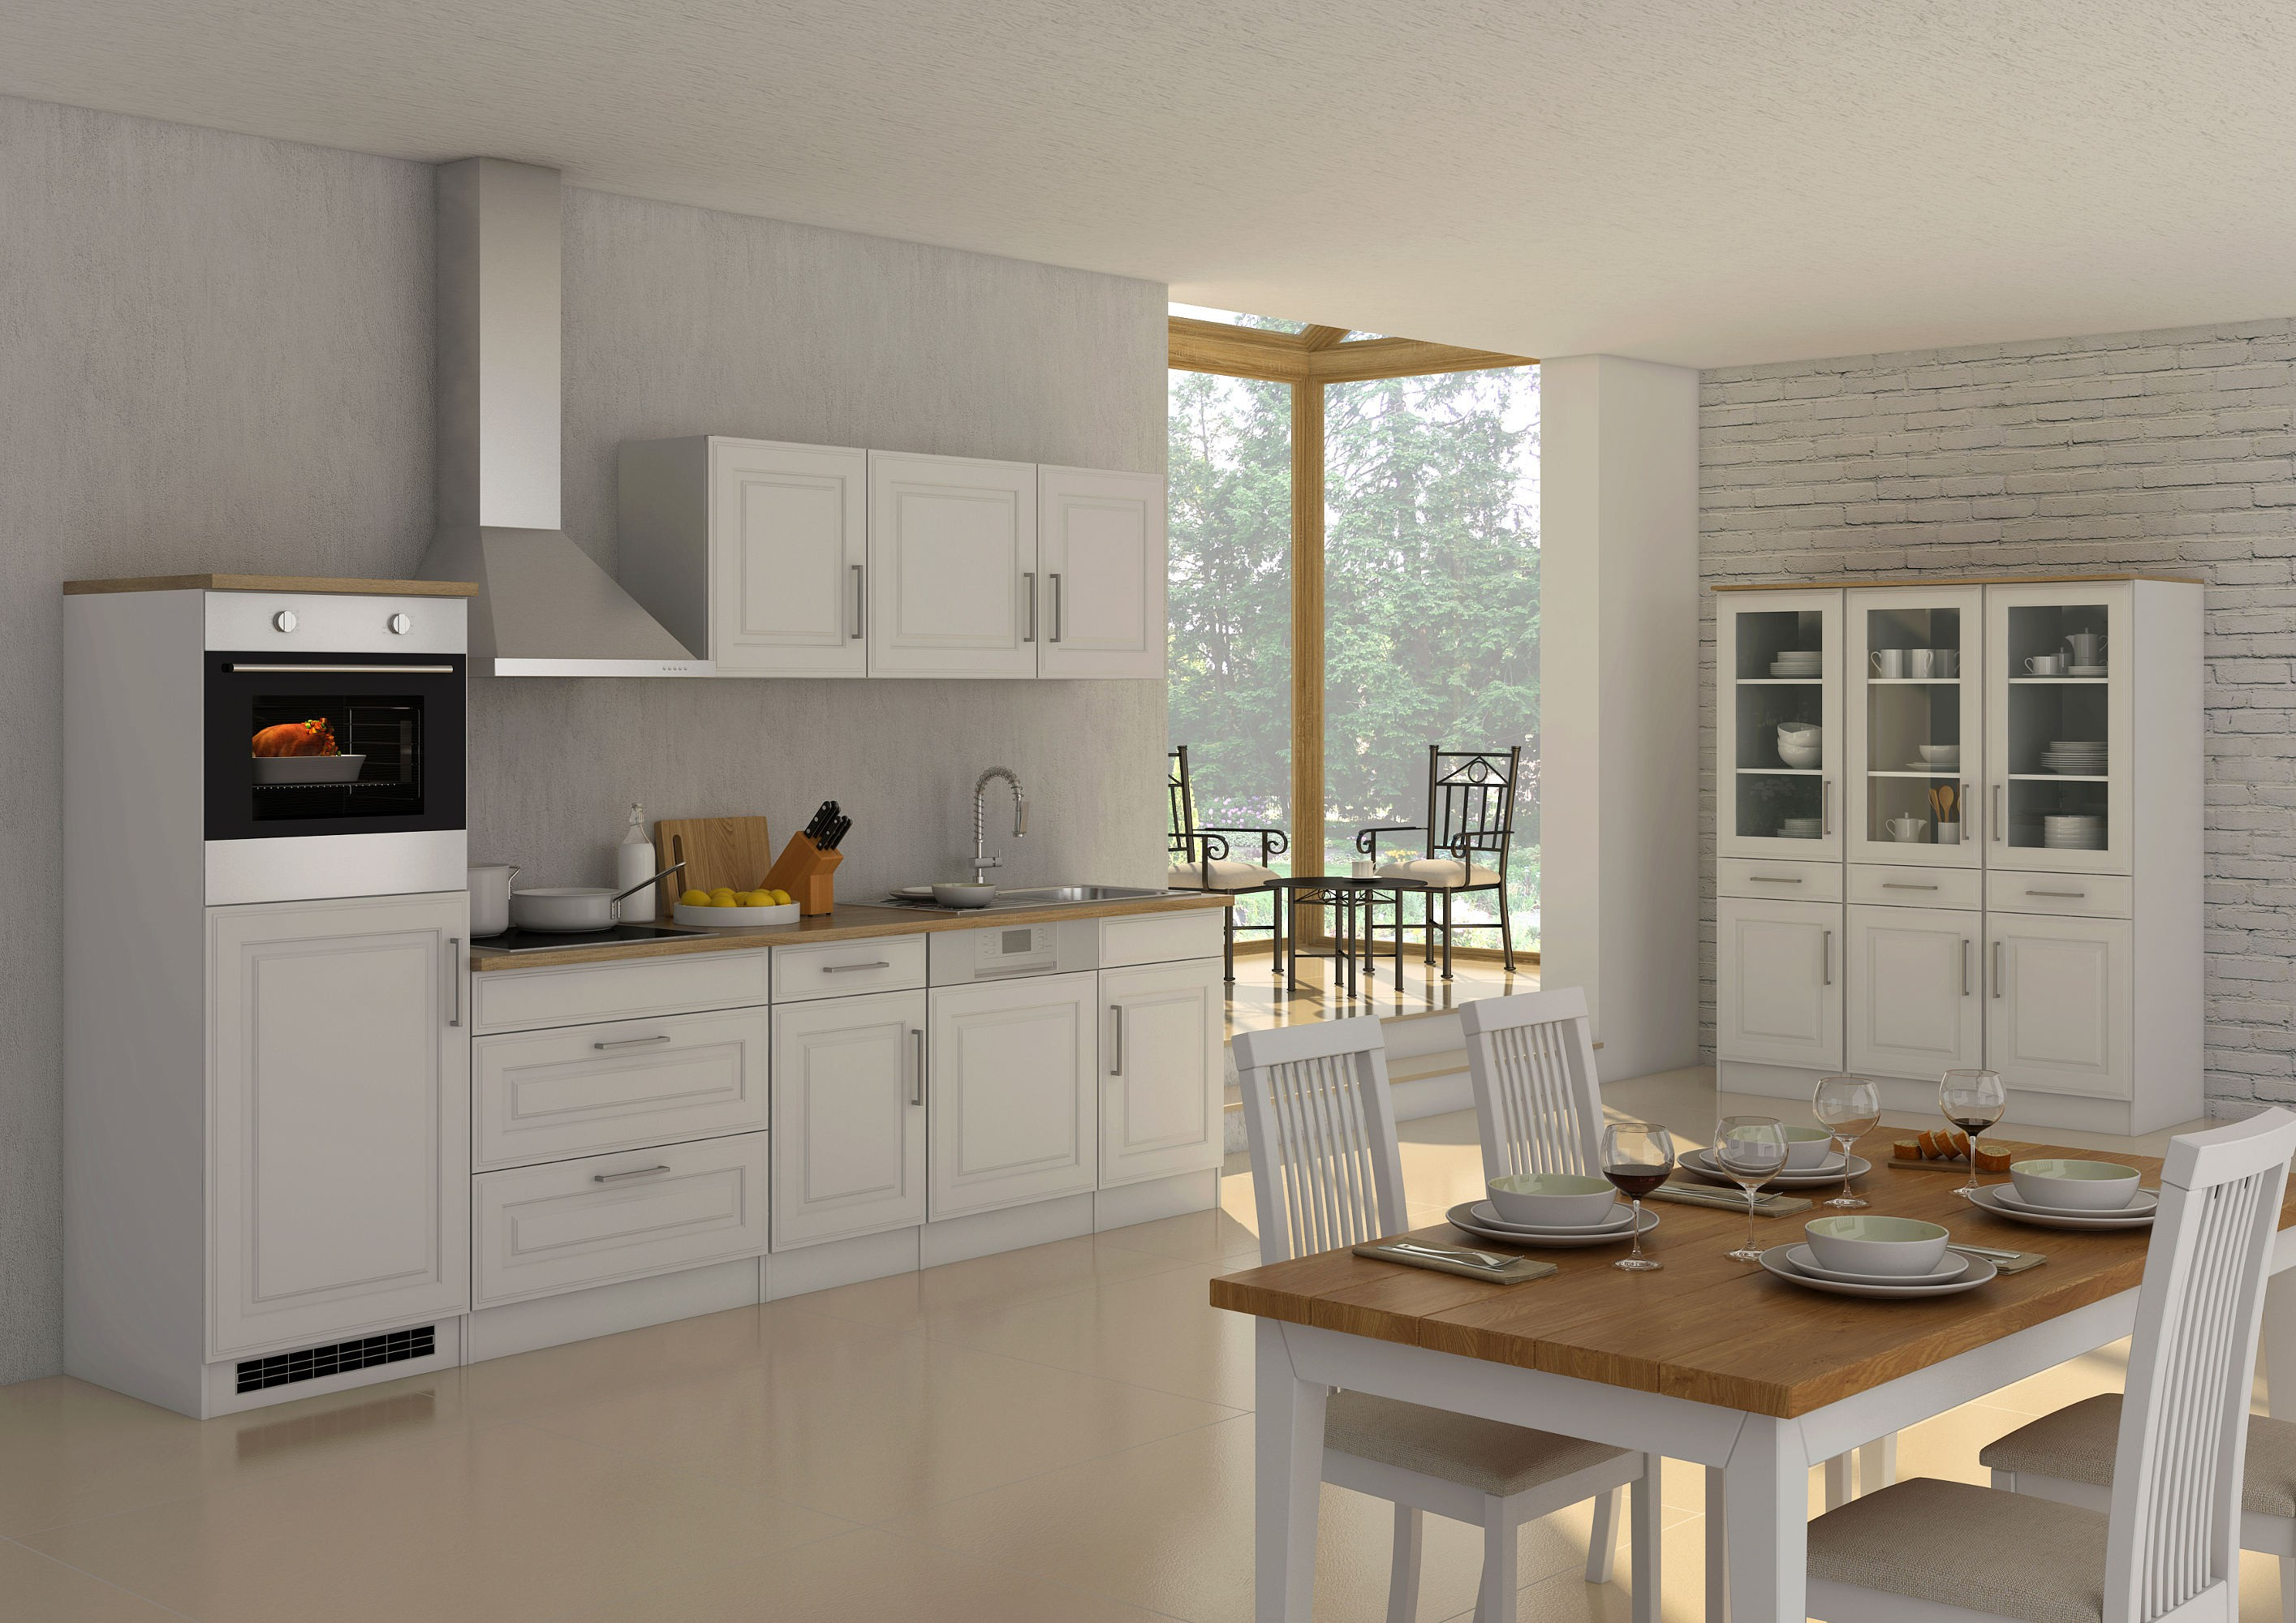 k chen h ngeschrank k ln 1 t rig breite 50 cm wei. Black Bedroom Furniture Sets. Home Design Ideas